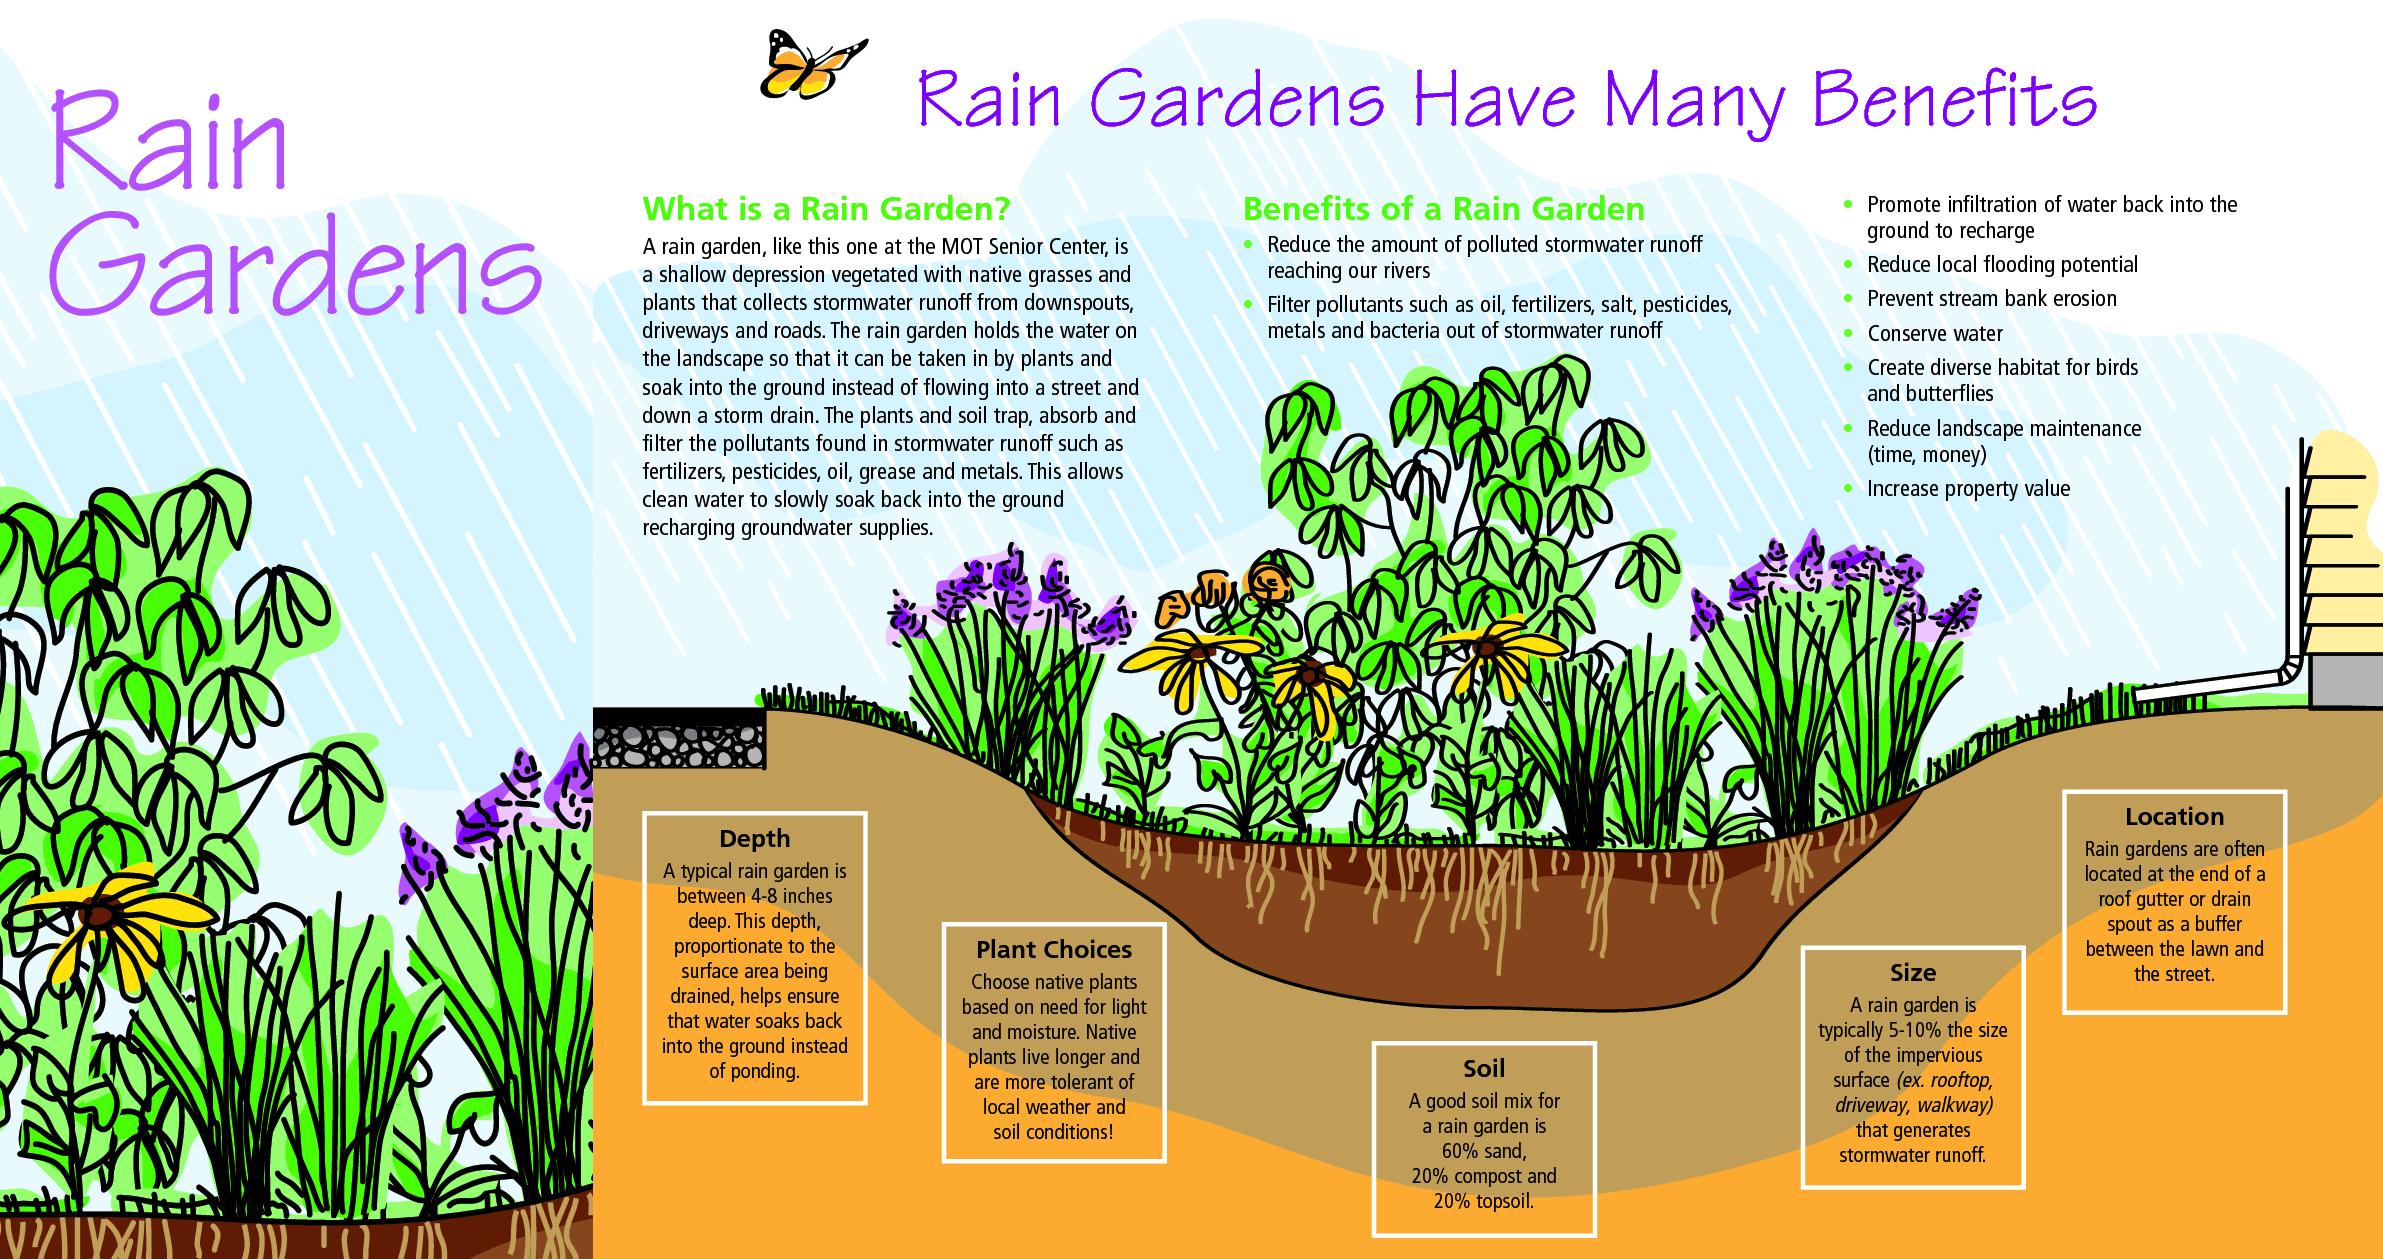 Diagram explaining the benefits of a rain garden